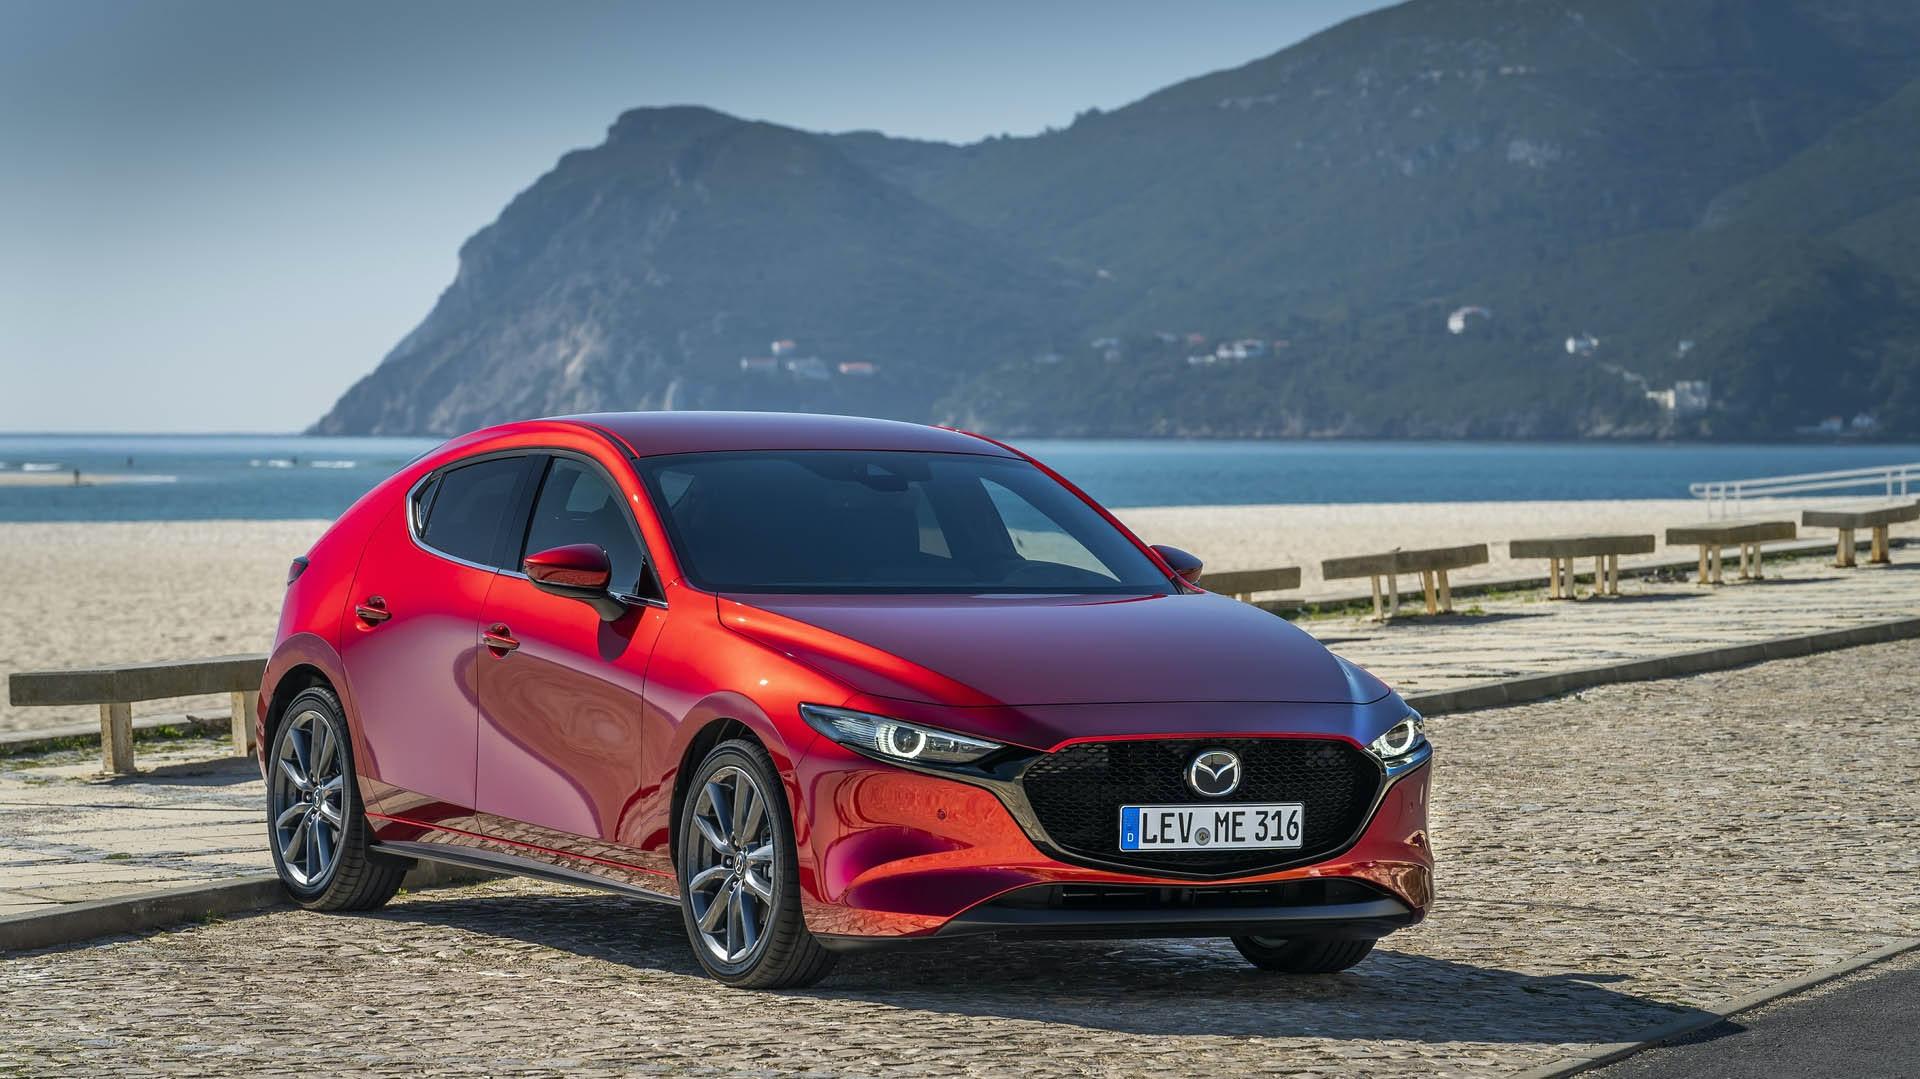 Den helt nye Mazda 3